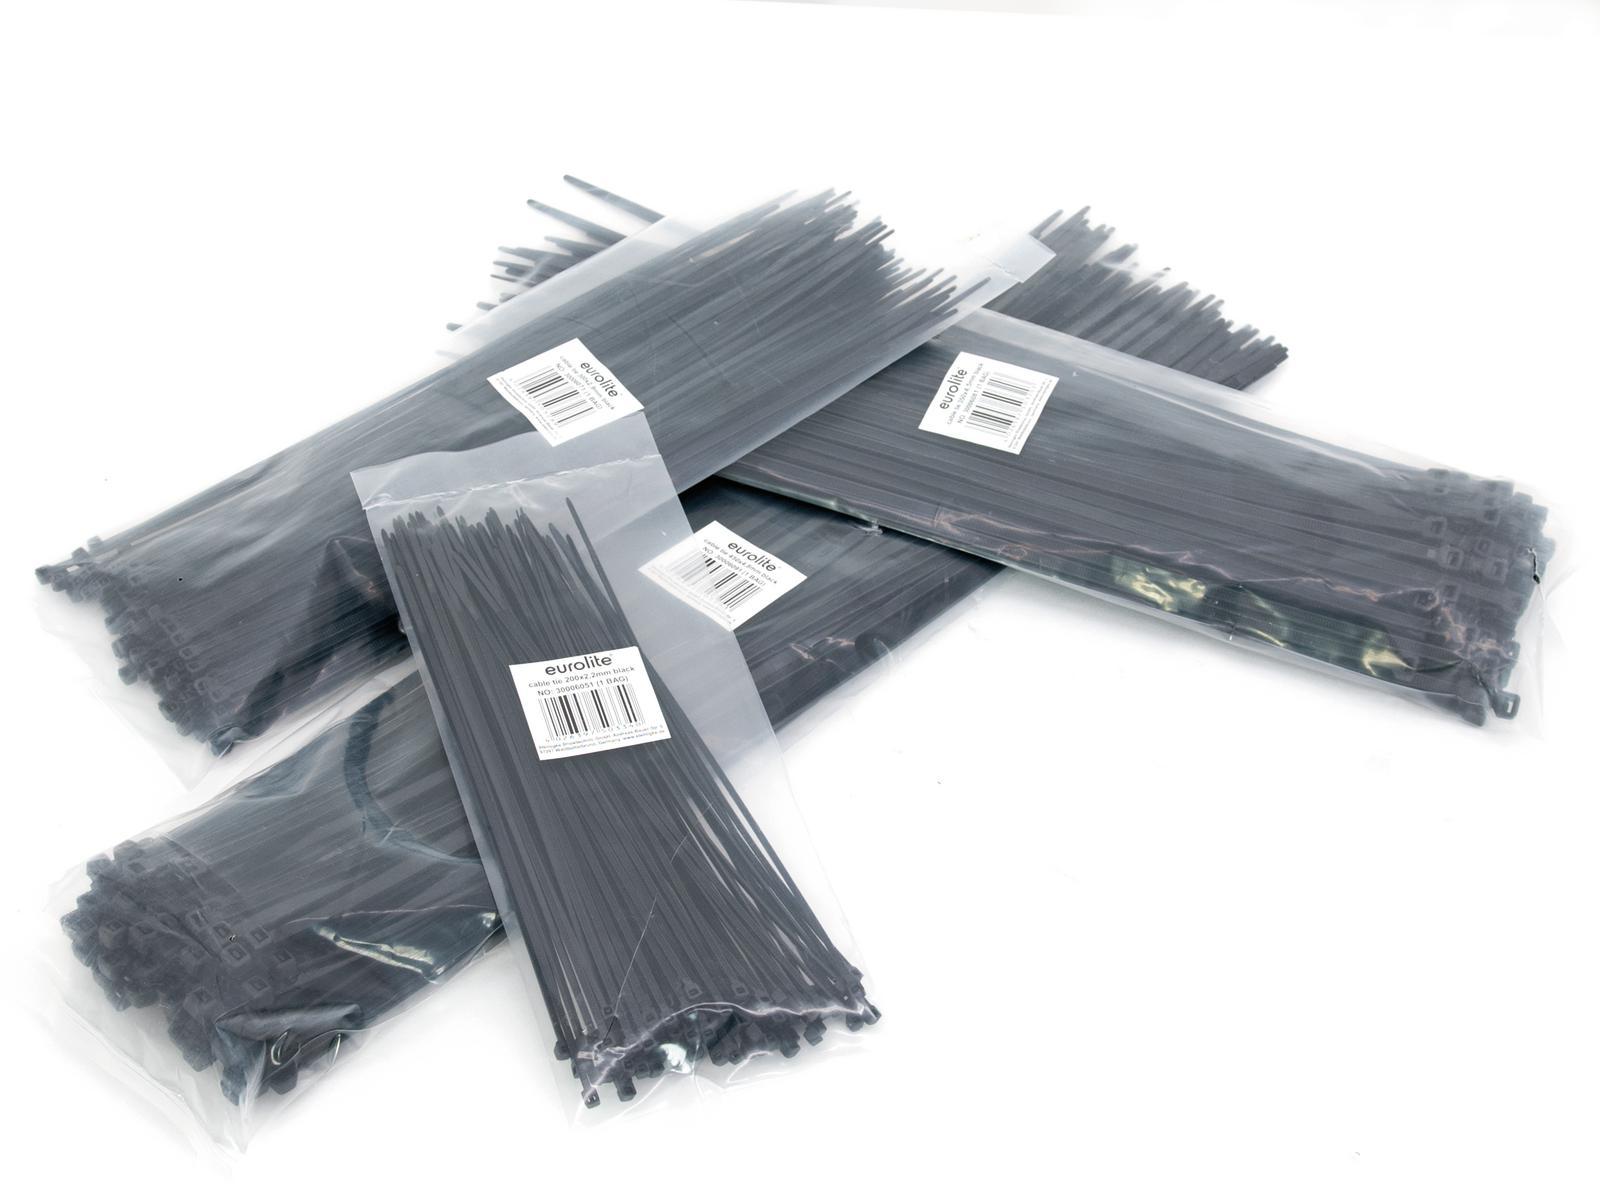 EUROLITE Cavo cravatta 200x2.5mm nero 100x